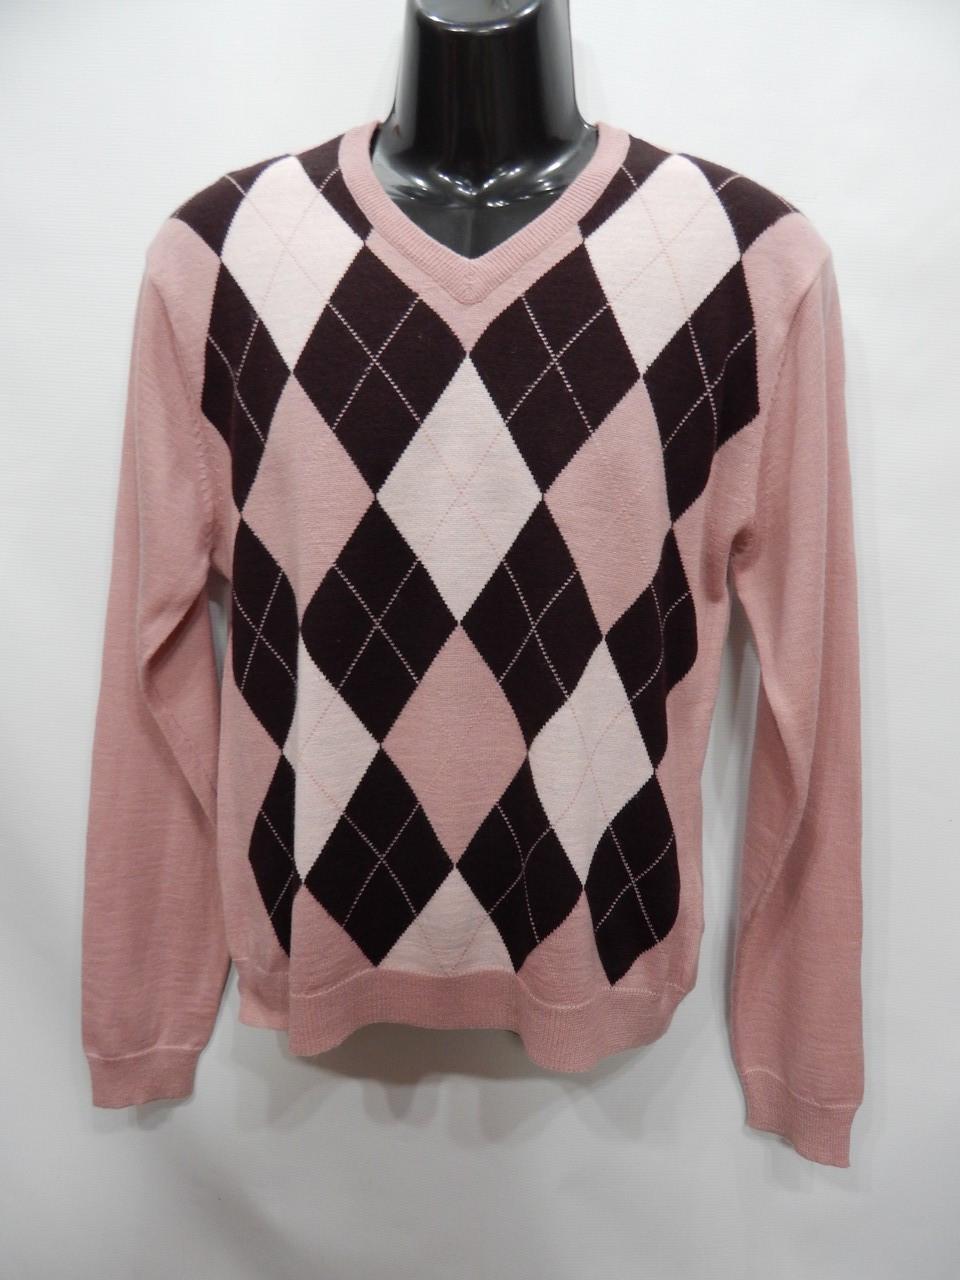 Свитер мужской шерстяной Terranova fashion р.50 024шмс